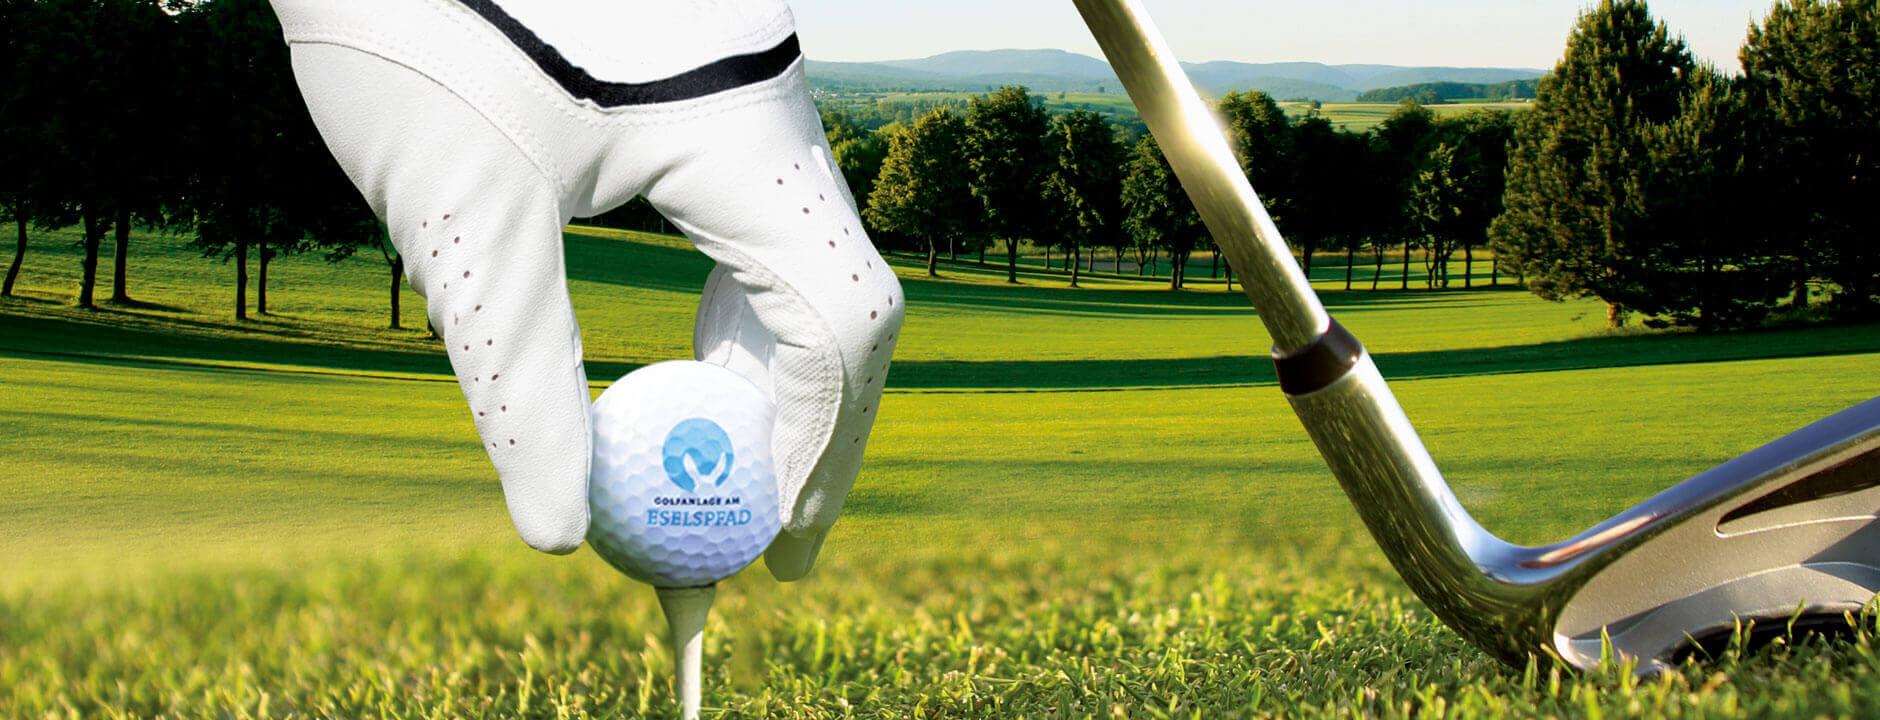 Golfplatz Eselsfpad einfach Golf Lernen